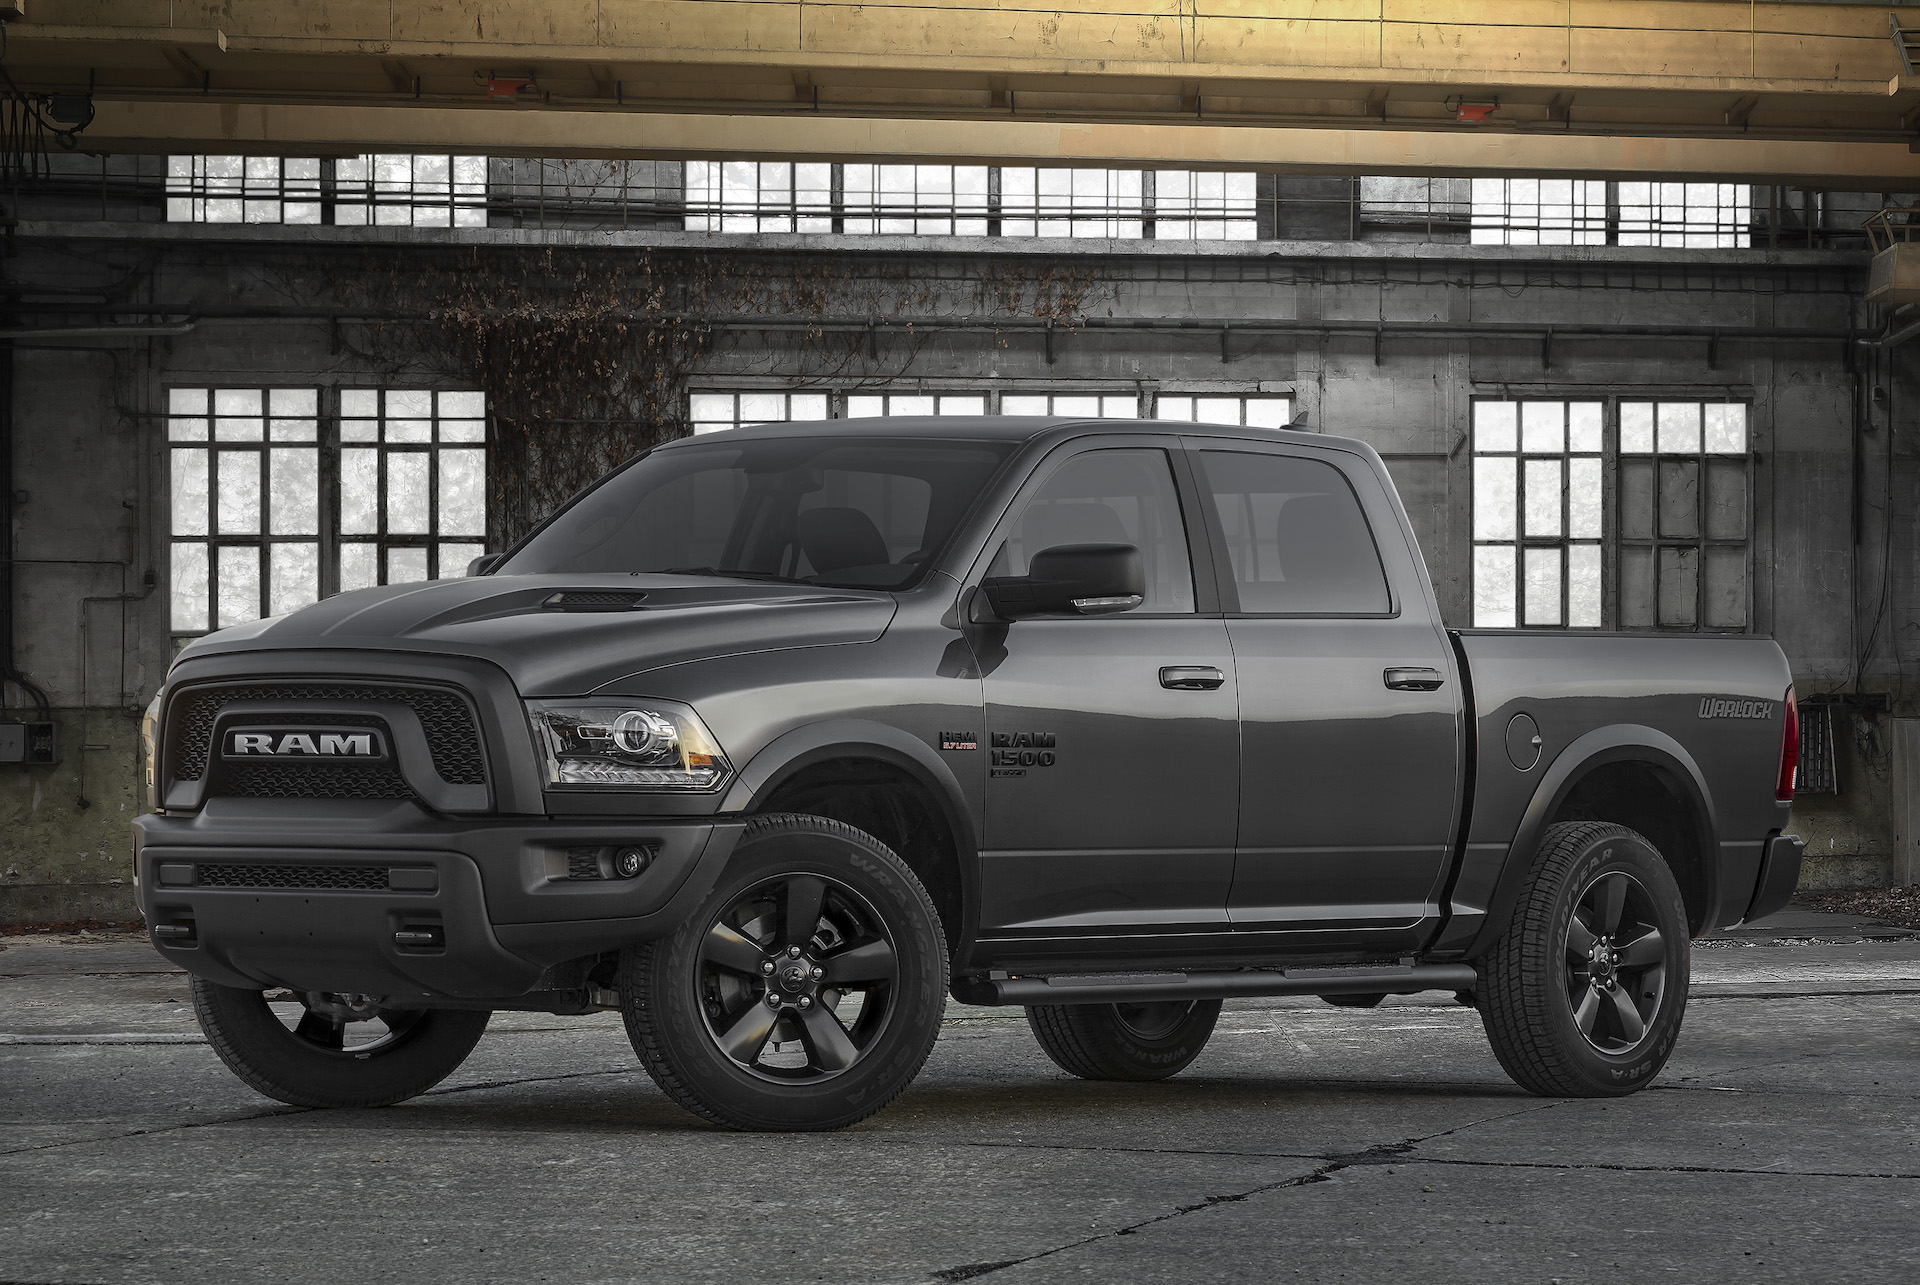 2019 Ram 1500 Redesign >> 2019 Ram 1500 Classic Warlock Fights For Pickup Truck Buyers